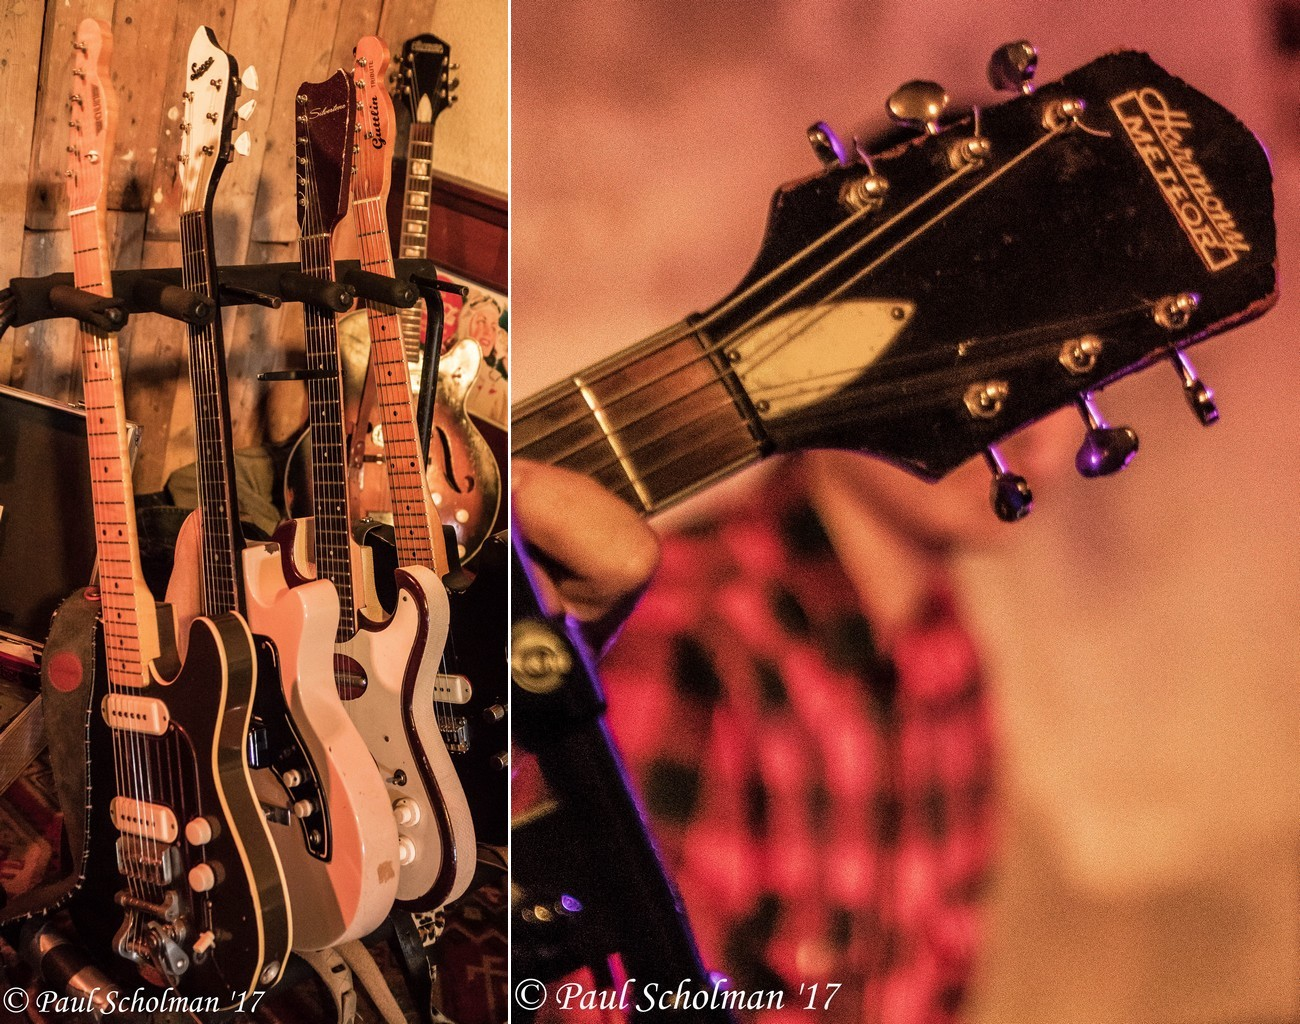 Instrument dubbel